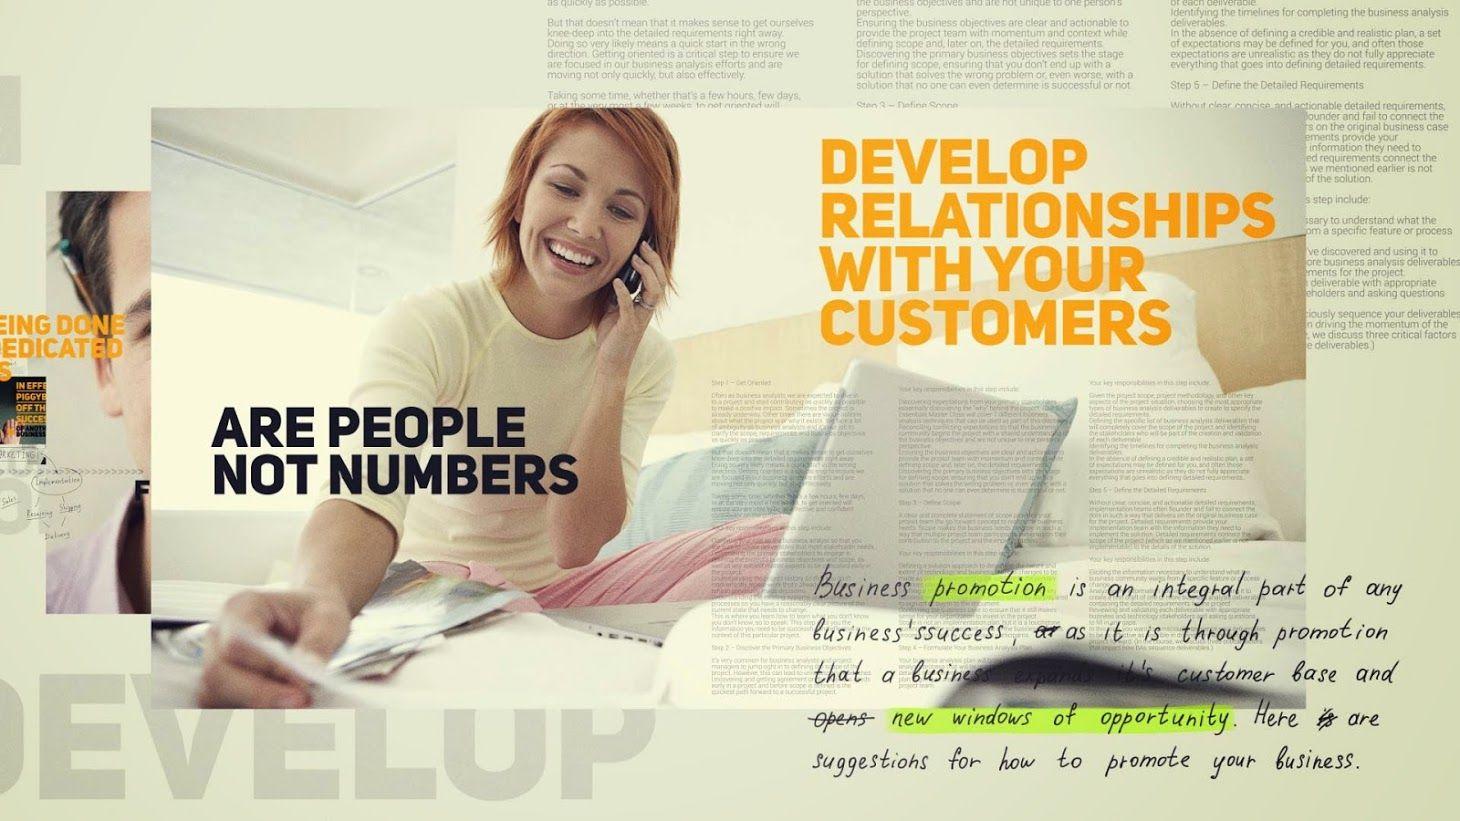 videohive پرومو تیزر تبلیغاتی کسب و کار